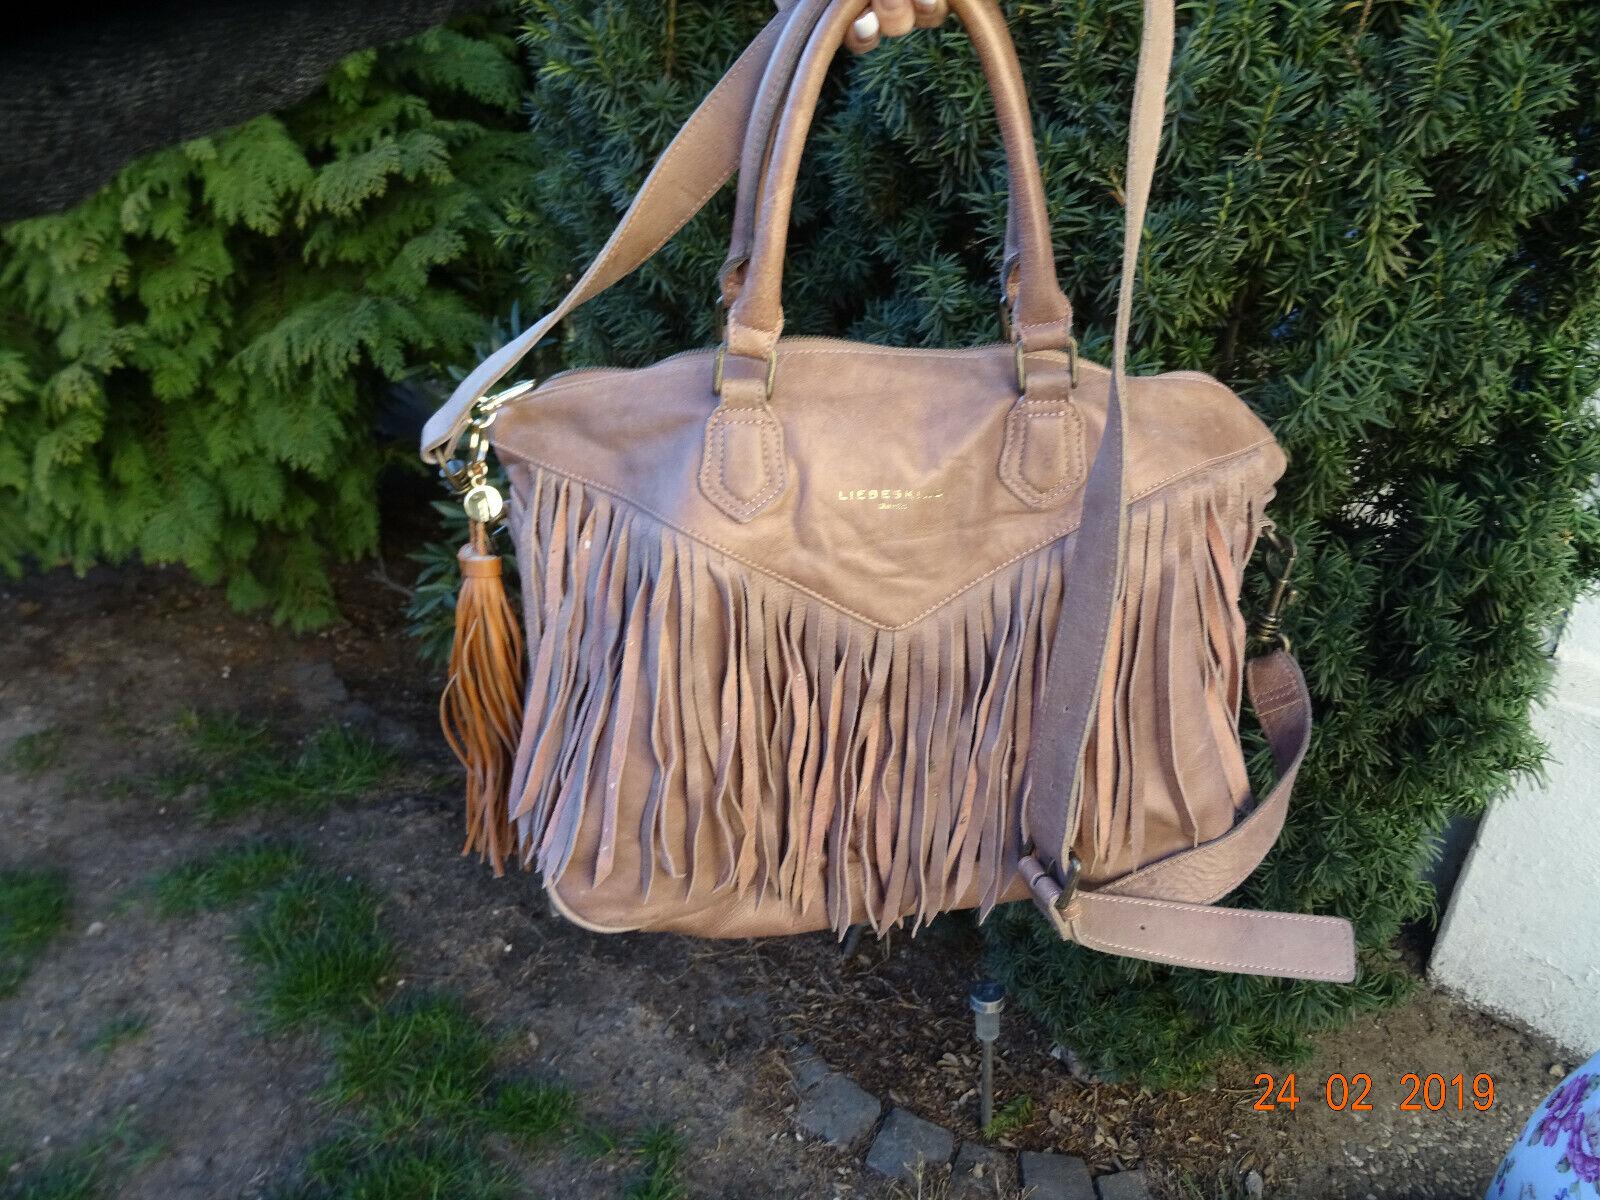 16f7284f760e9 Liebeskind Paula Fringe Leder Handtasche Umhängetasche Fransen metallic rosa